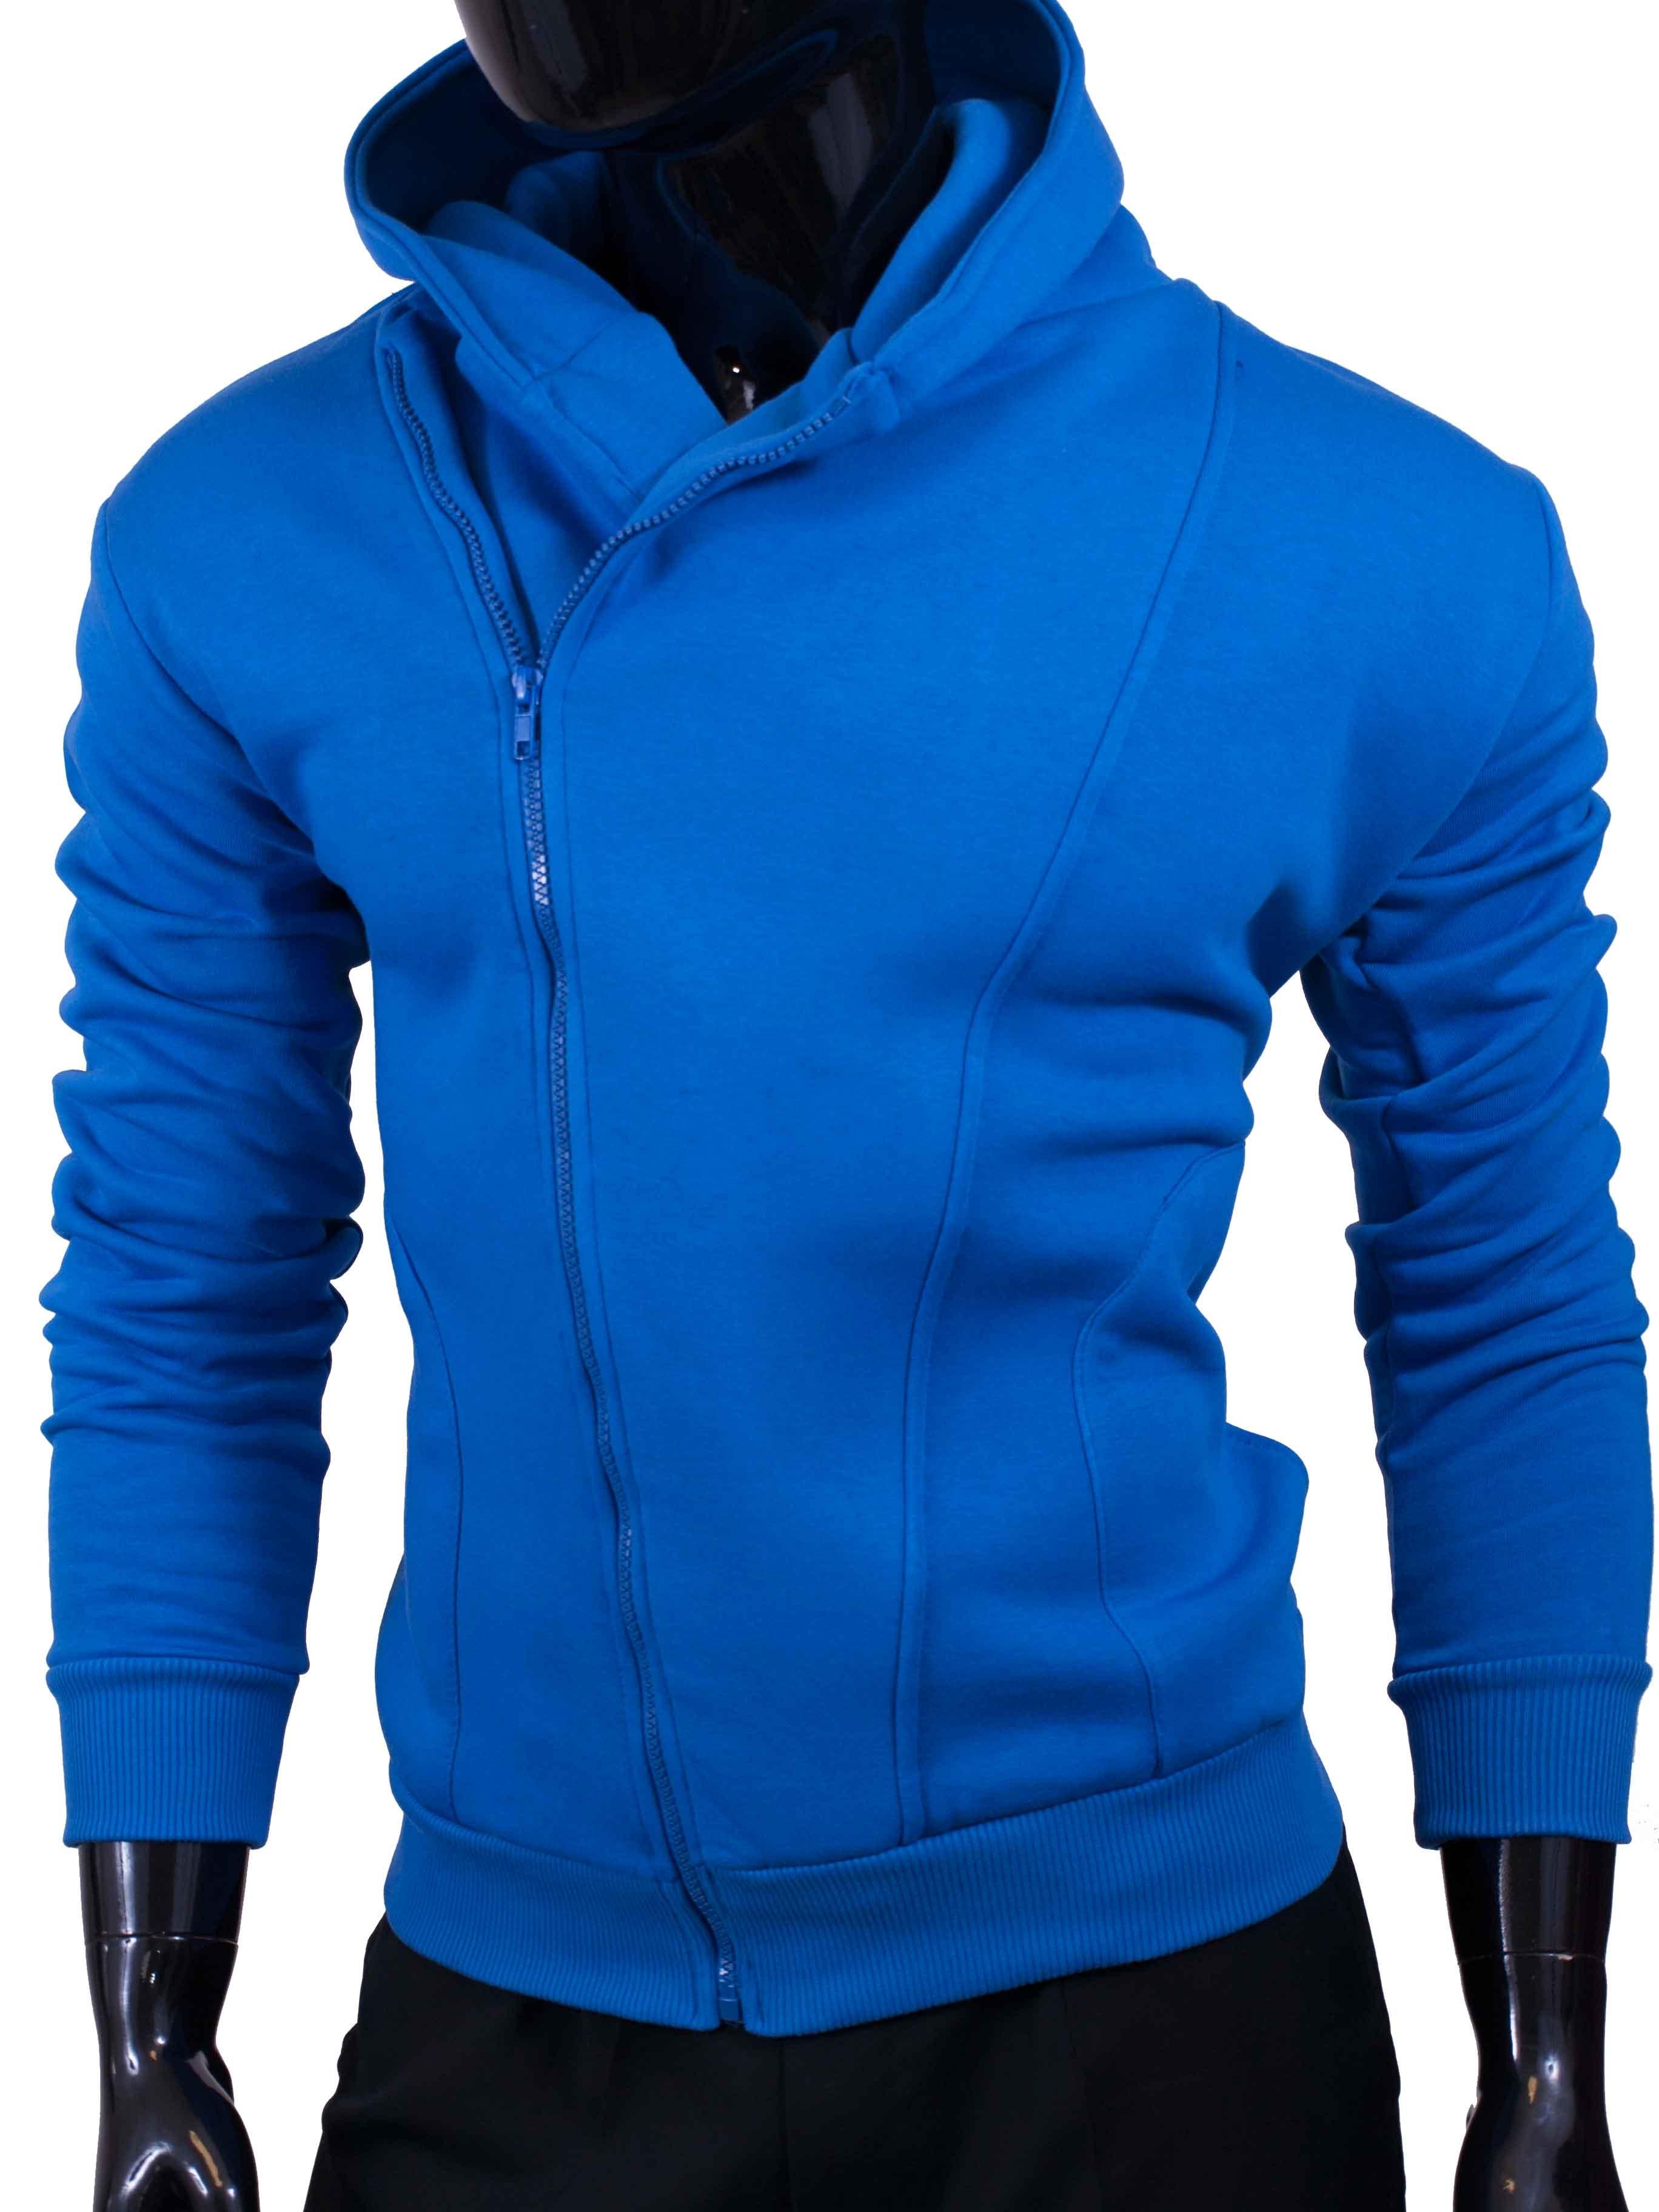 Pánská mikina ACS modrá